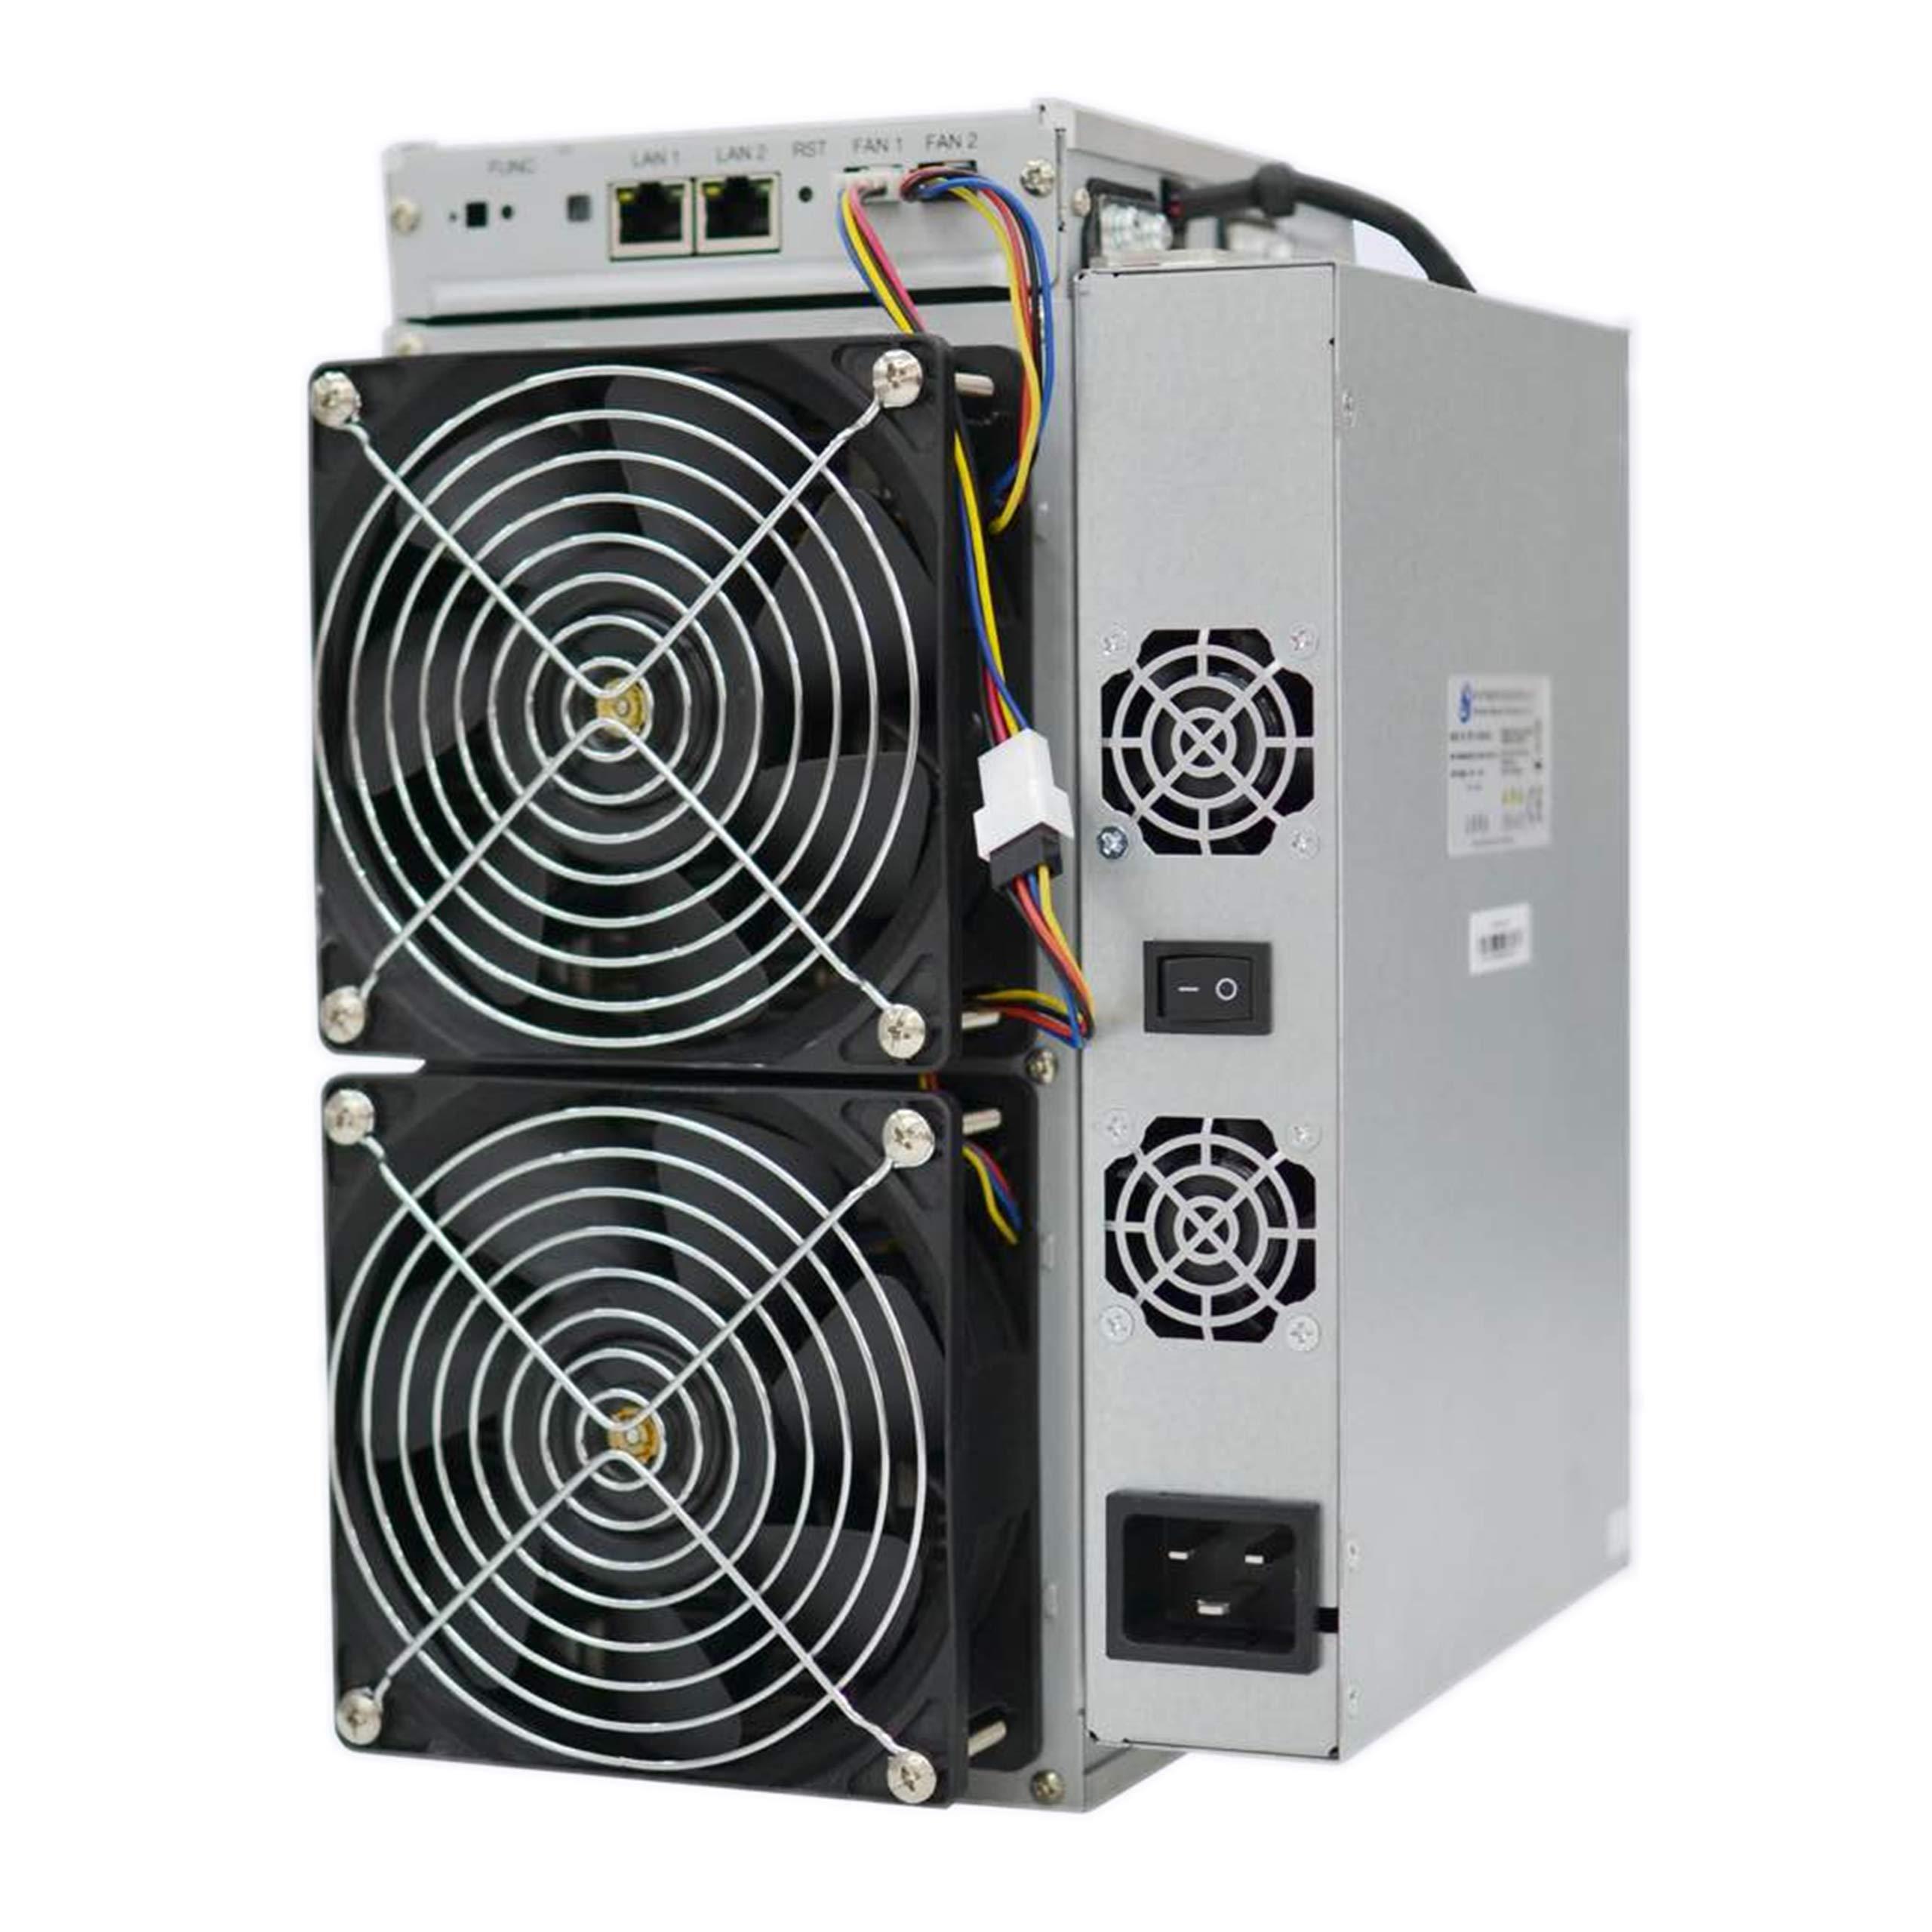 Canaan Avalon Bitcoin Miner 11.5th/S 1200W Avalonminer 821